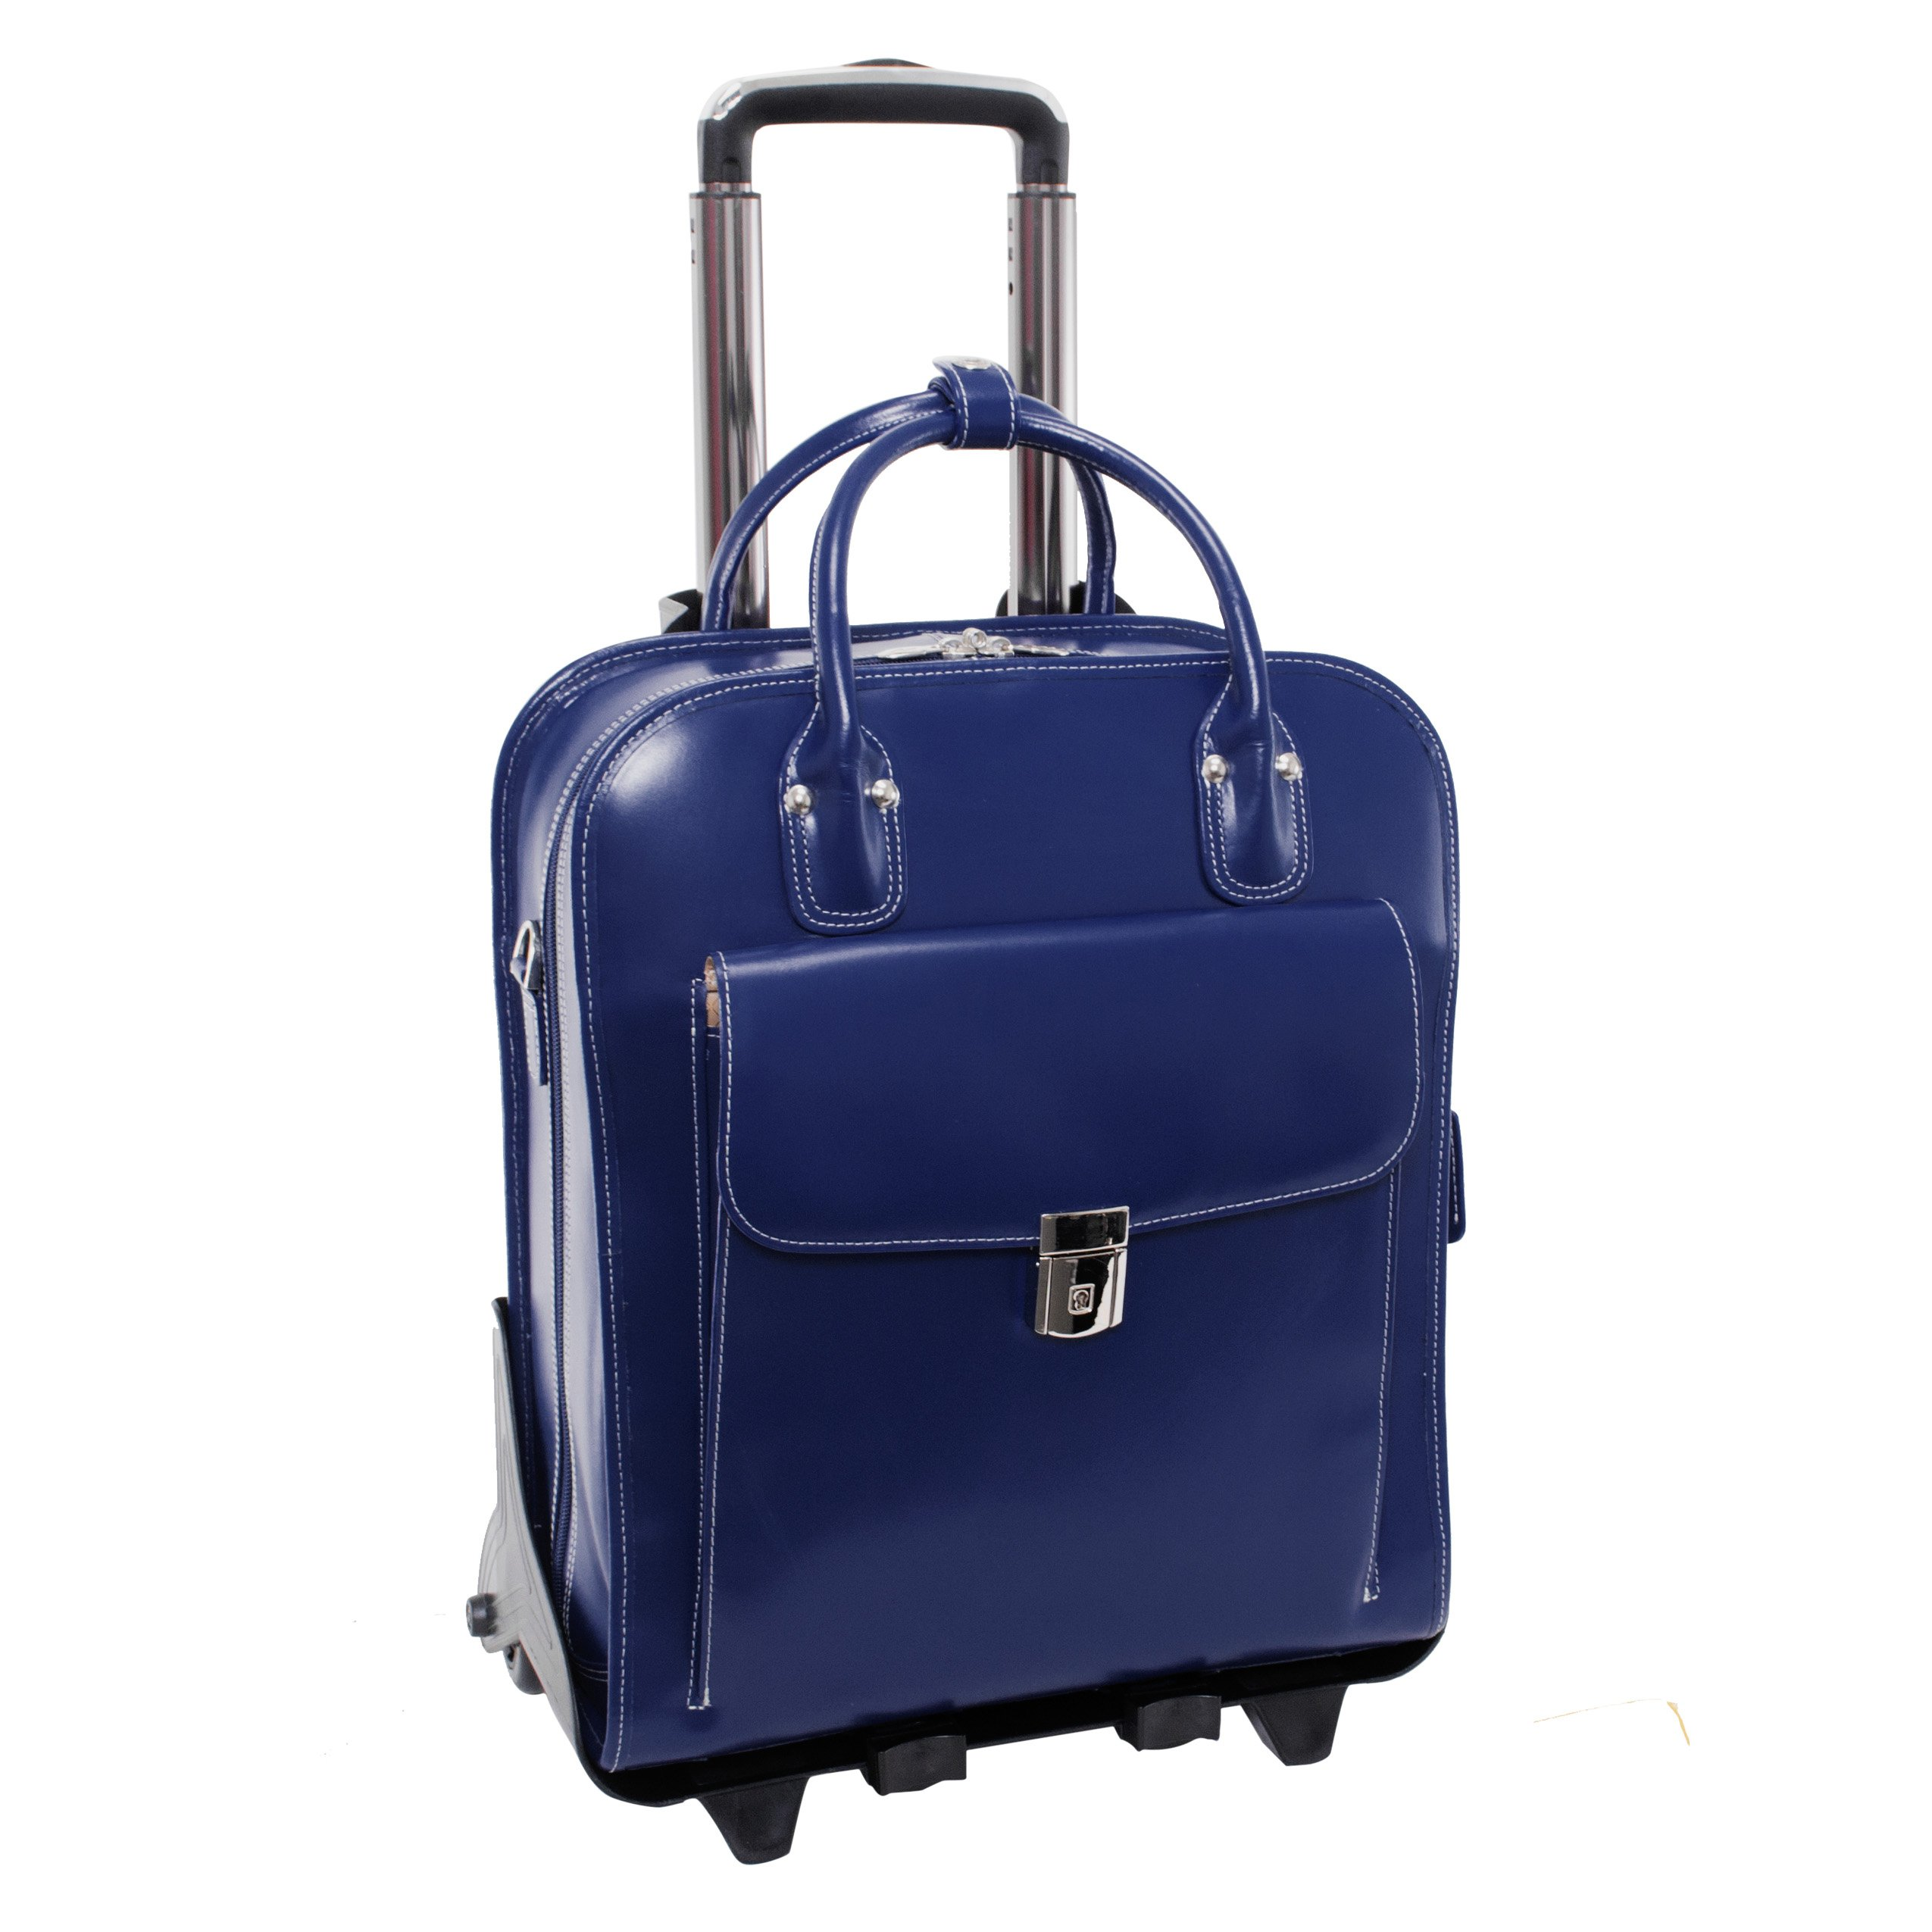 McKlein USA LA Grange Navy 15.6'' Leather Vertical Detachable, Wheeled Ladies' Briefcase (96497)